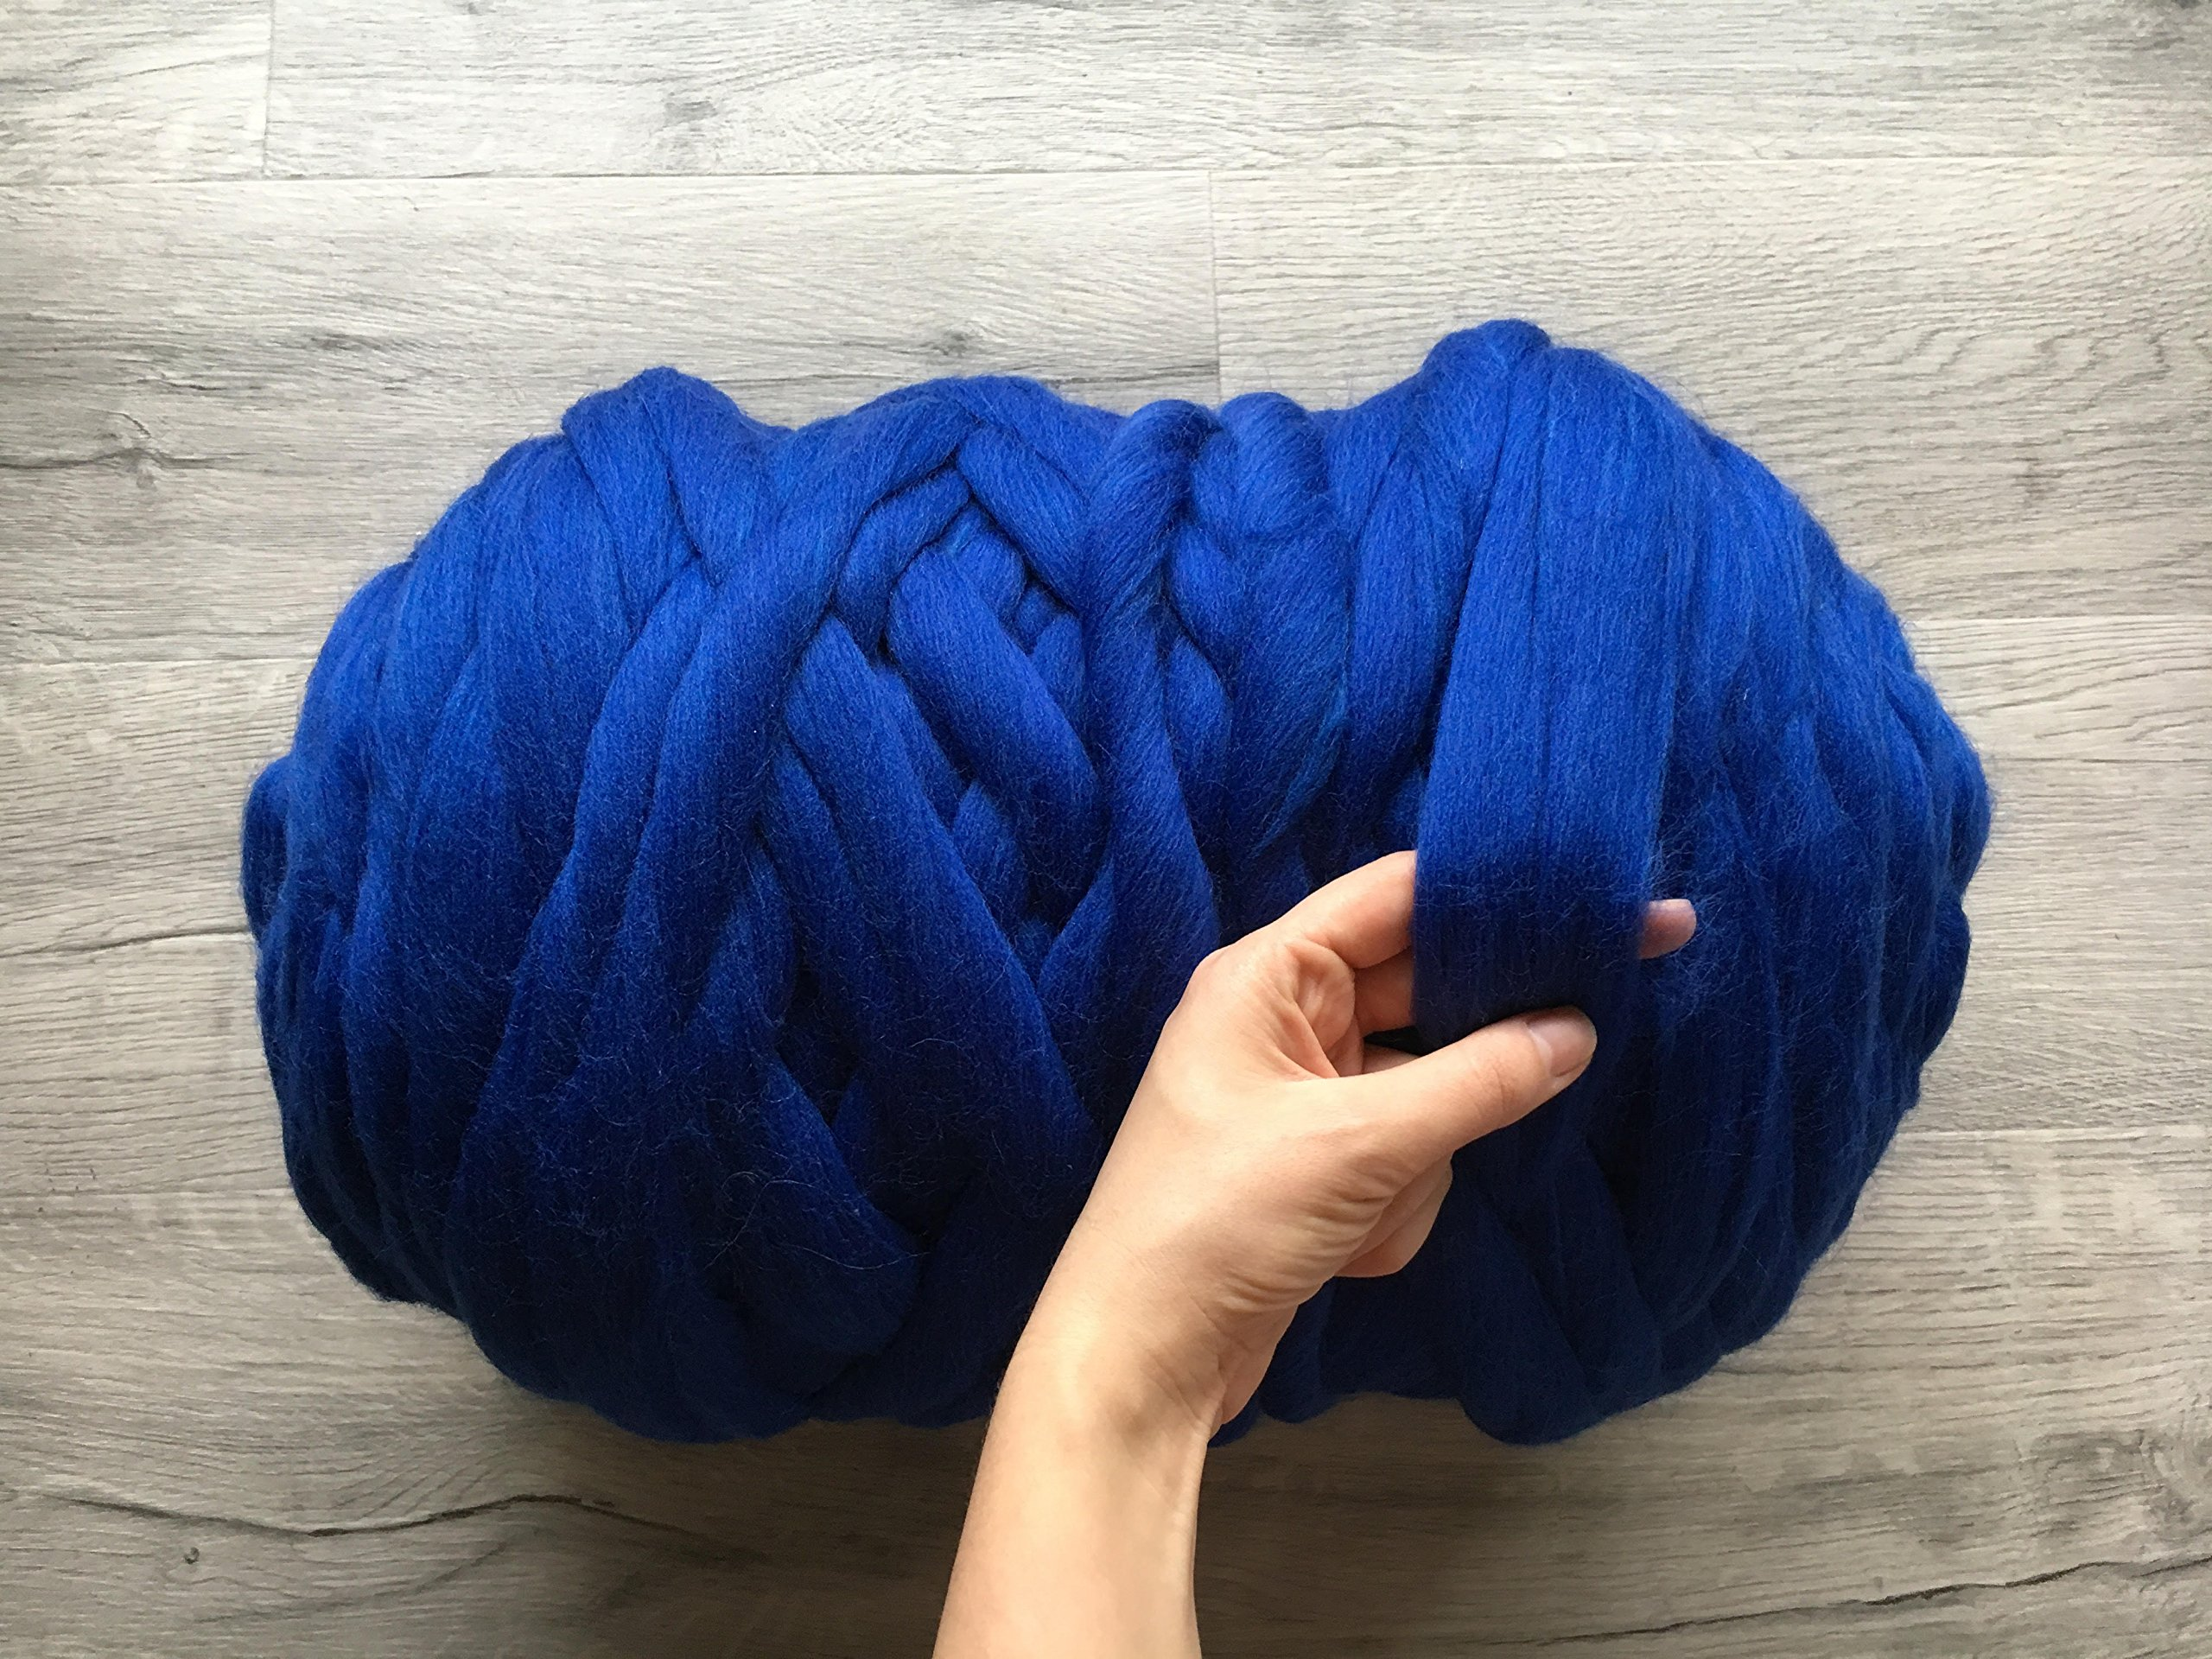 Merino wool yarn Chunky arm knitting blanket throw fiber Super bulky soft giant knit DIY large crafts for handmade thick knitted blanket 21.5 microns huge yarn Row Australian merinos